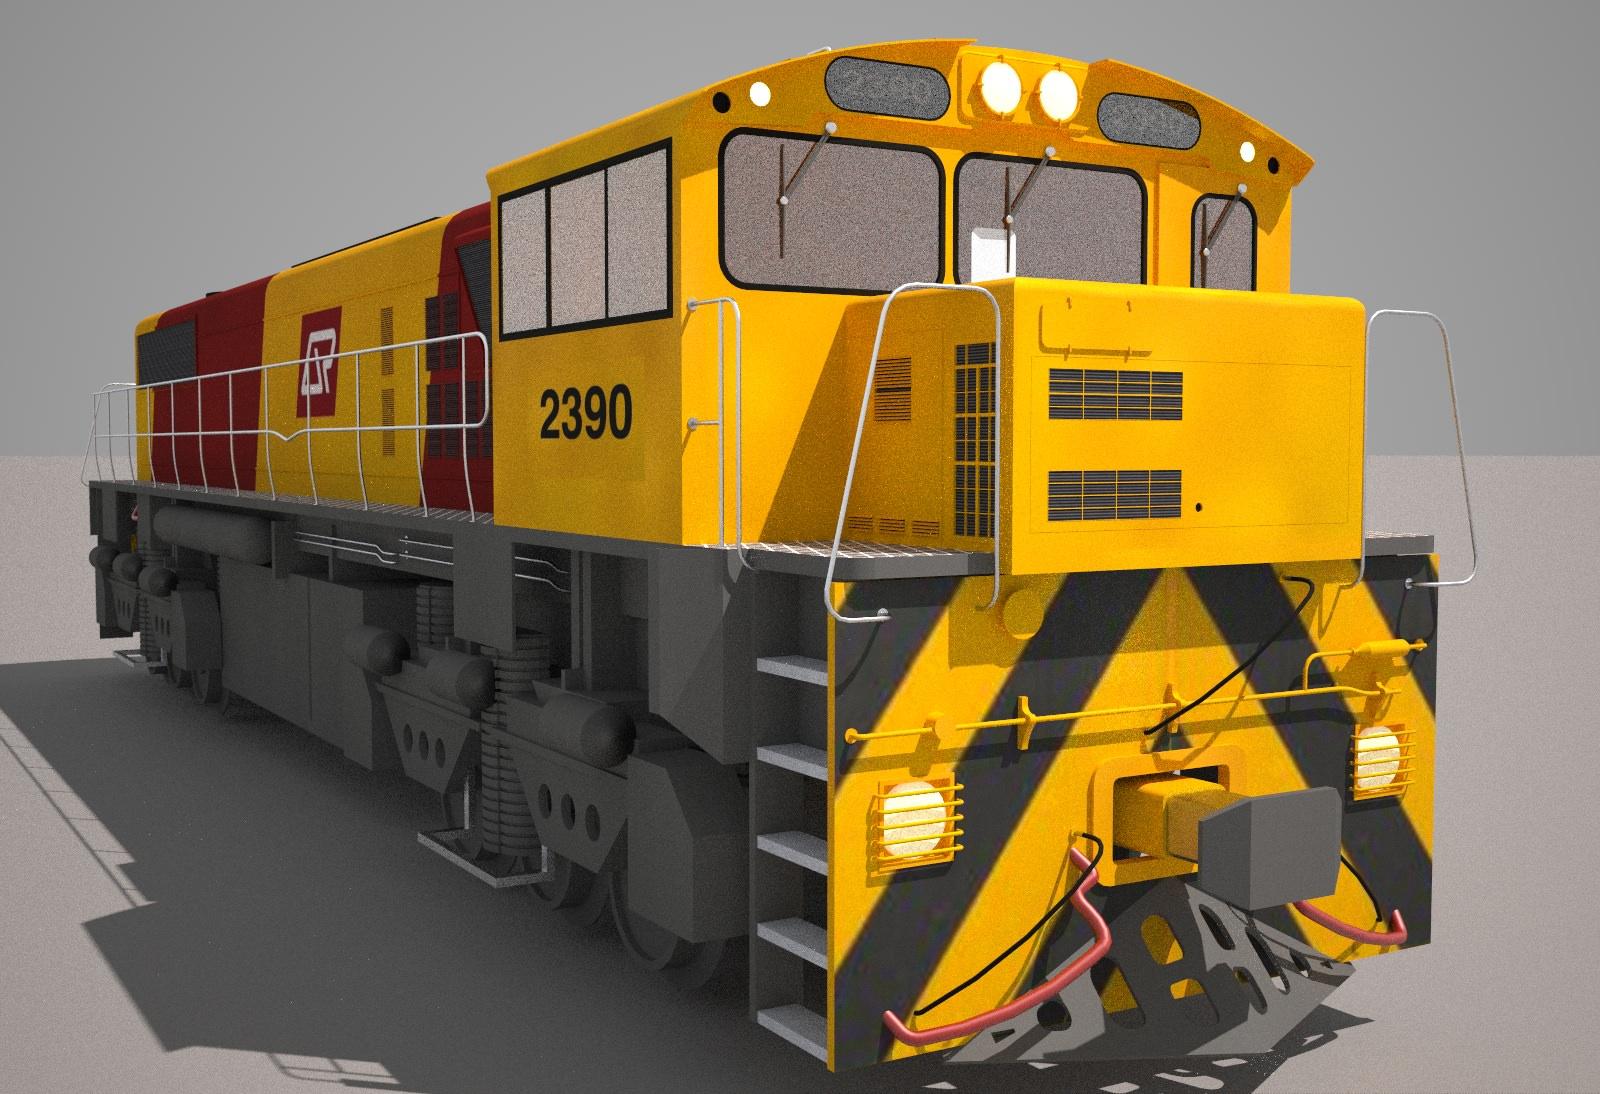 ... qr freight train class 2390 3d model obj mtl 3ds fbx hrc xsi dae skp 4  ...